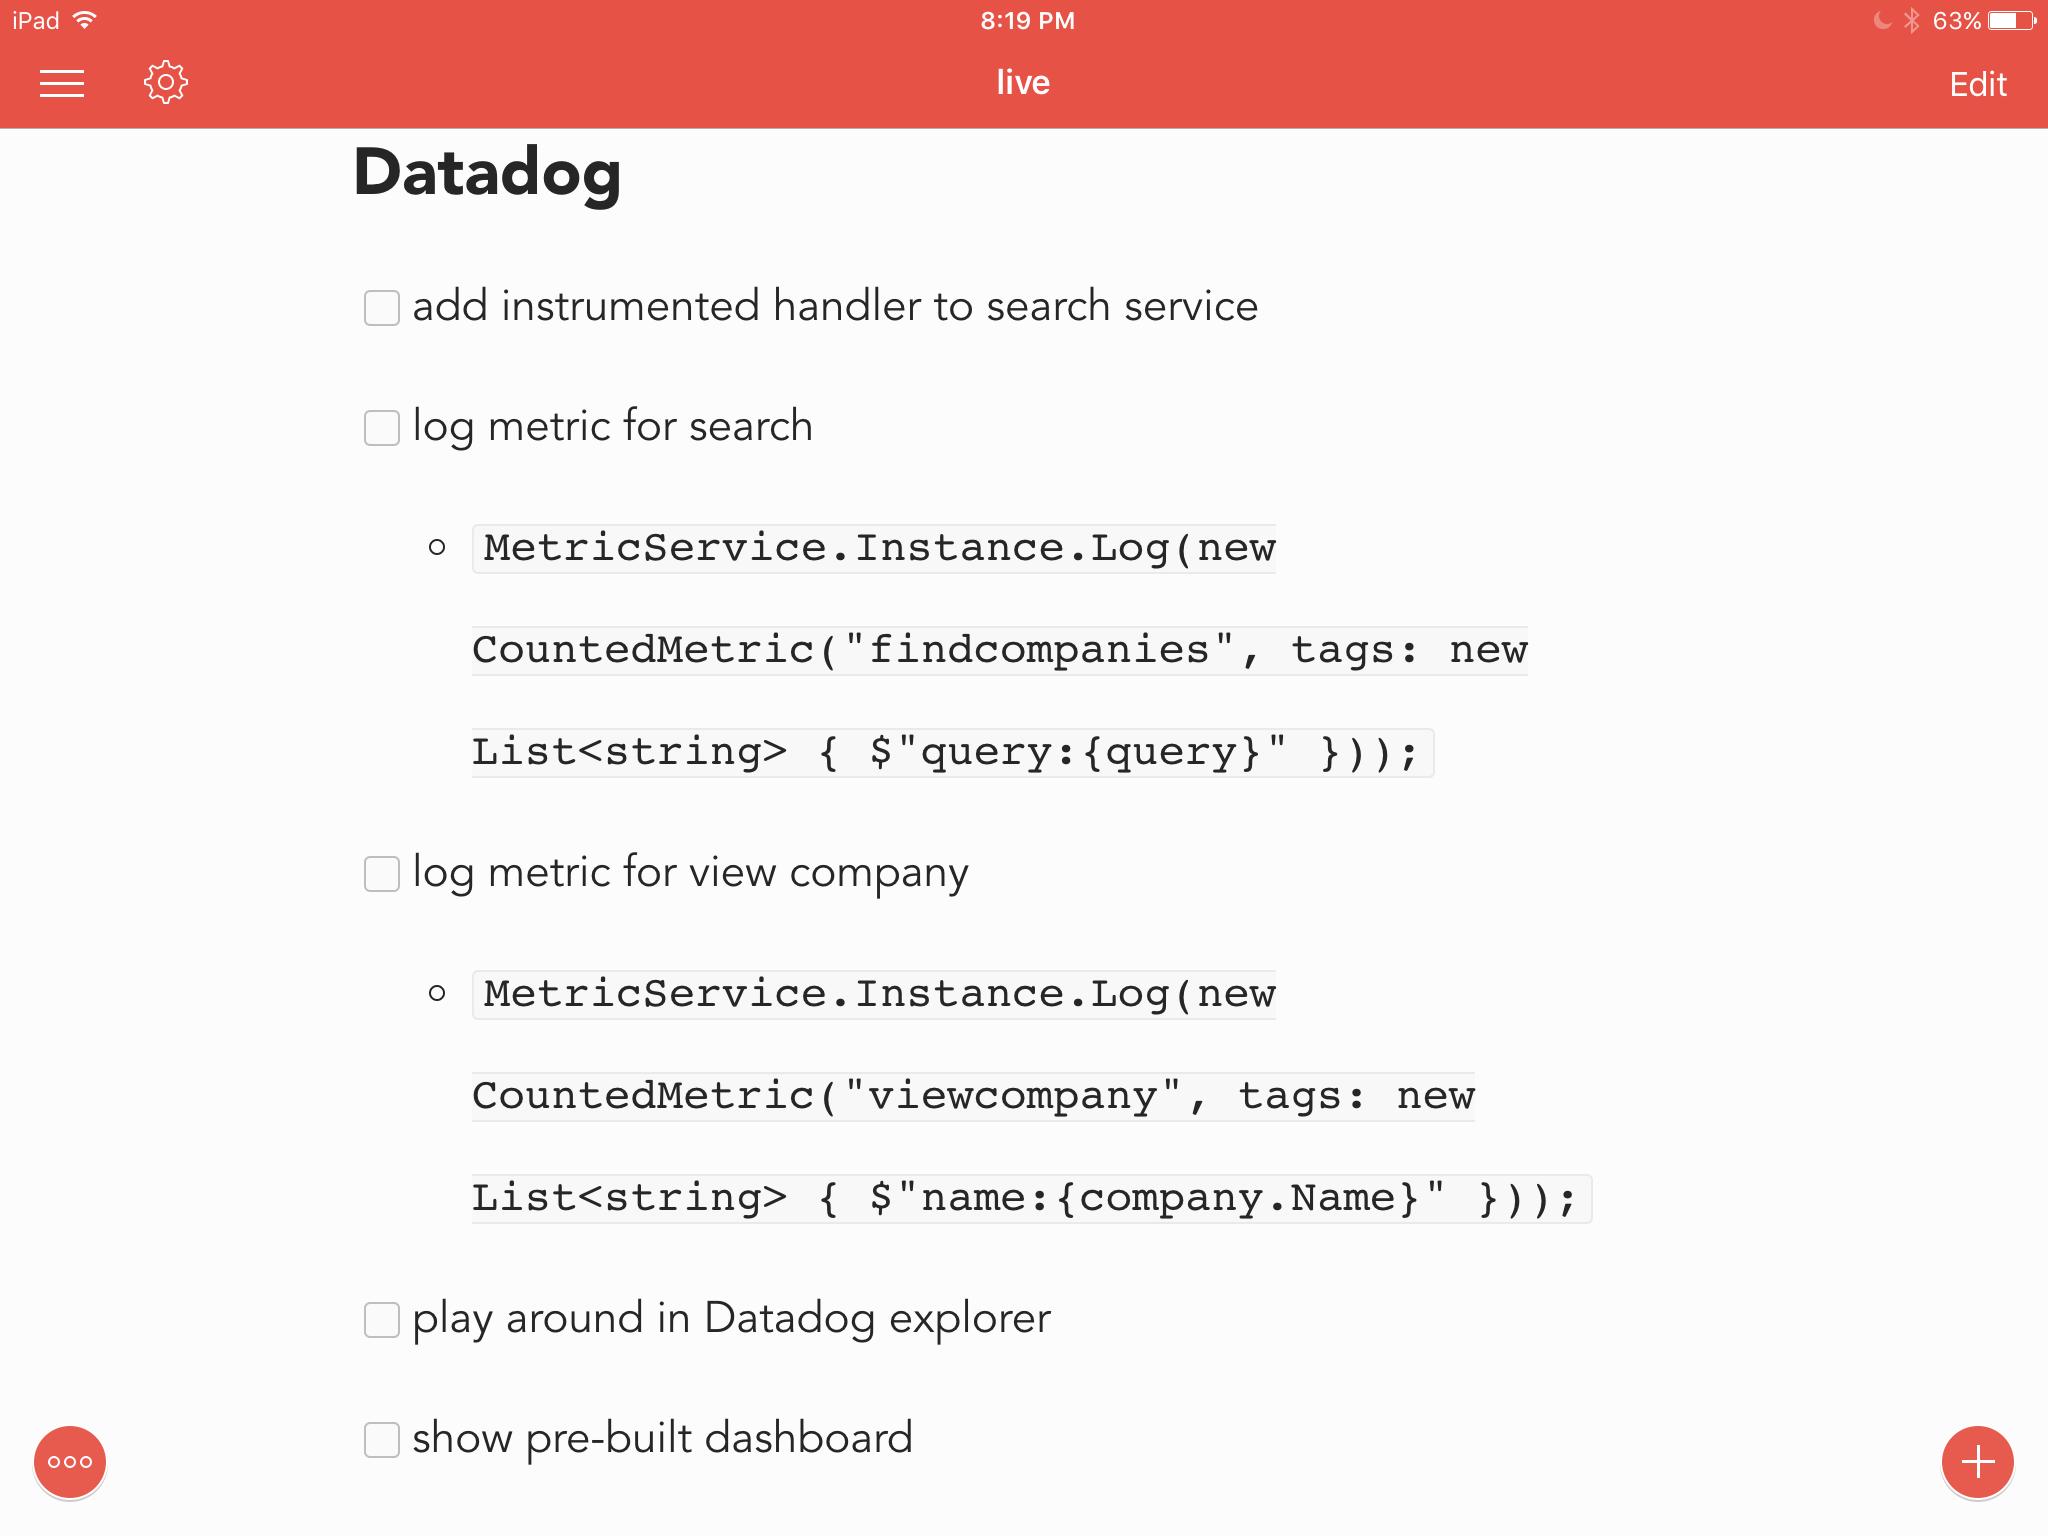 Coding checklist items